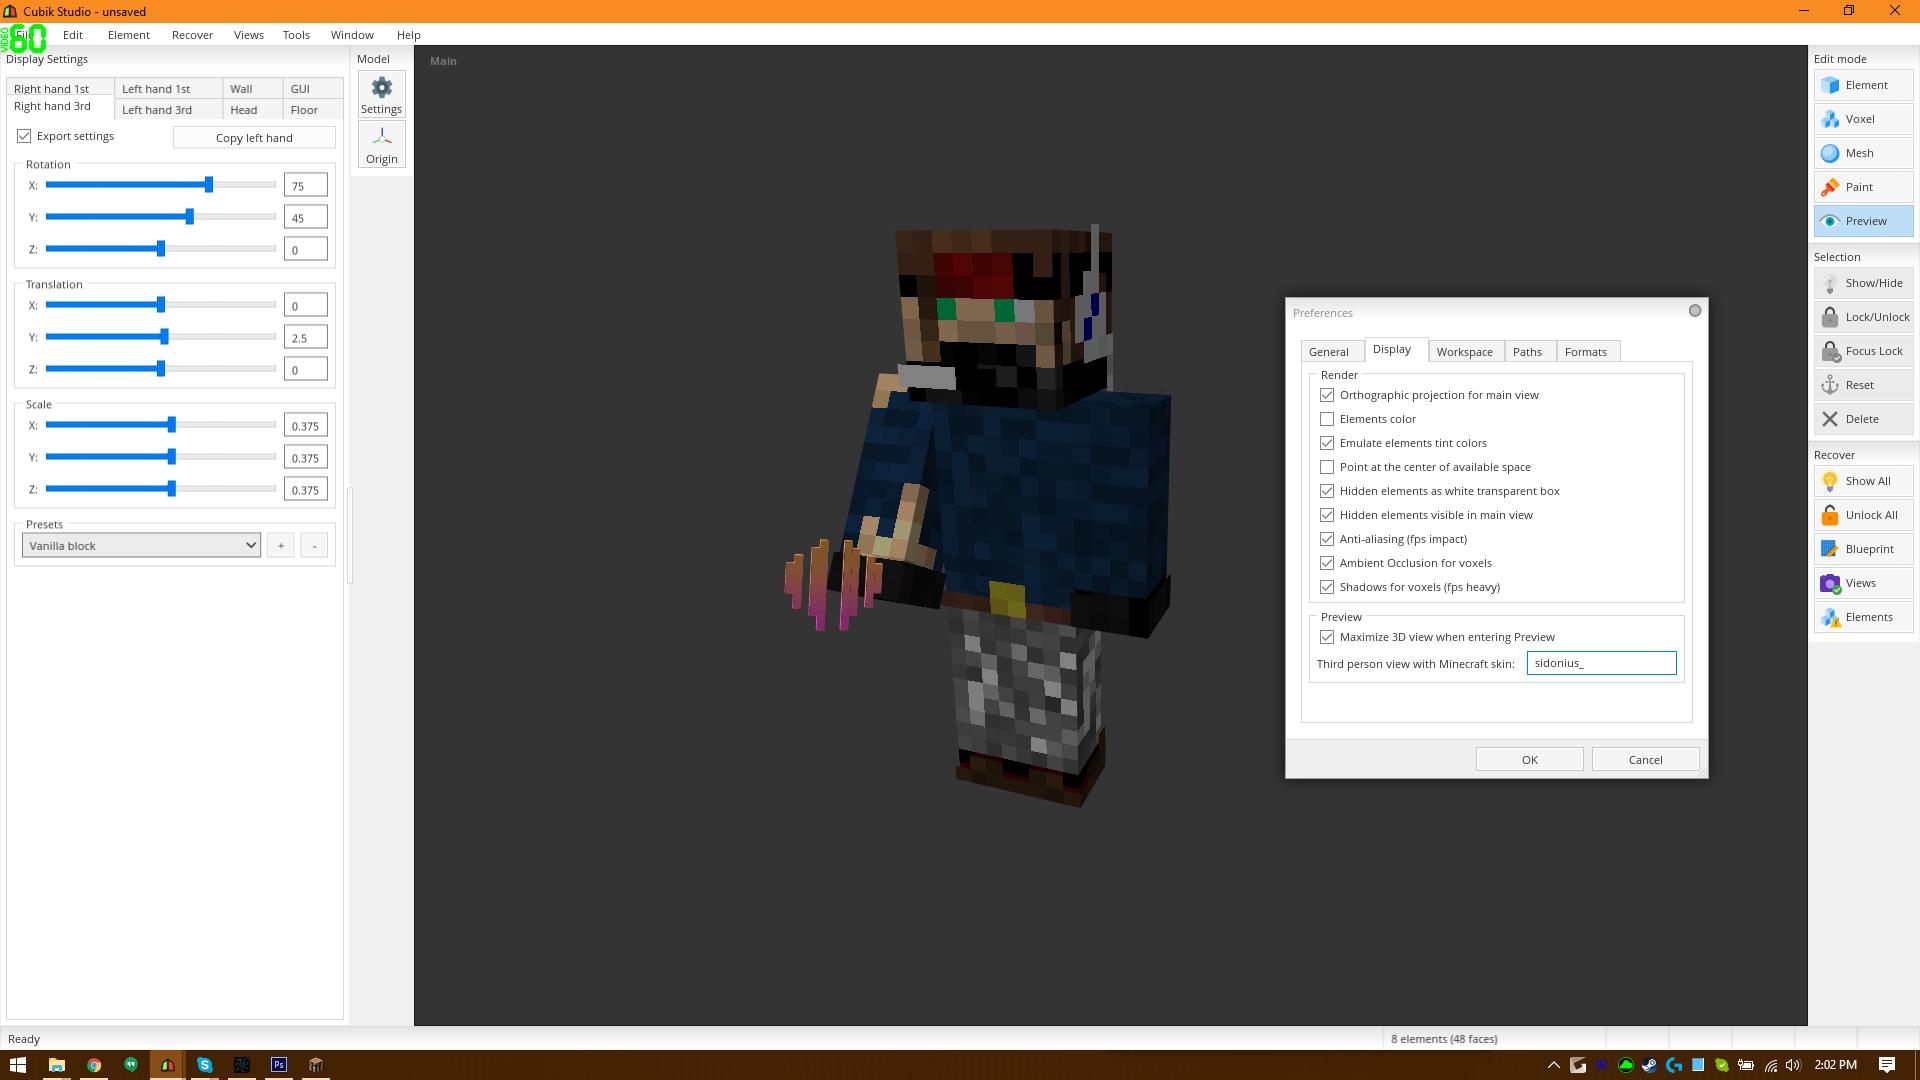 Skin preview issue - Cubik Studio